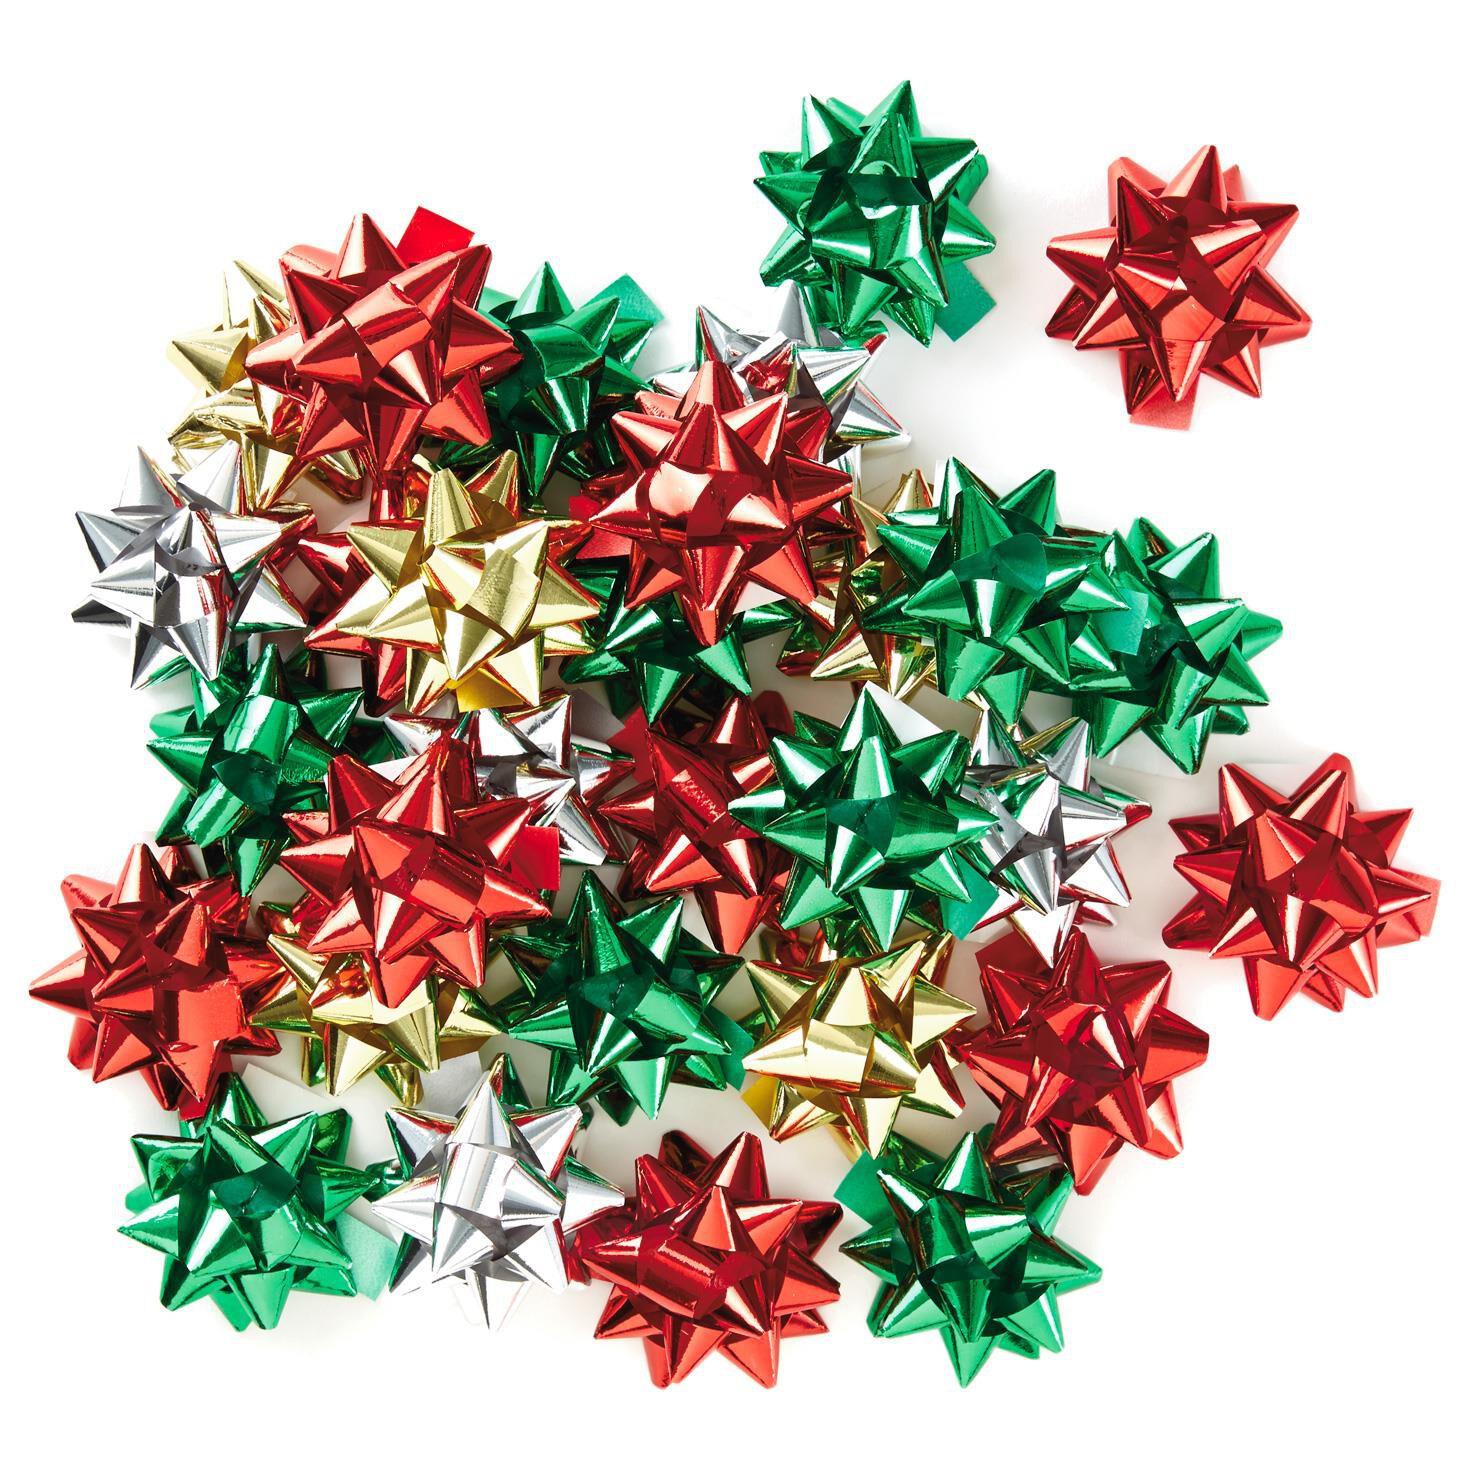 Assorted mini metallic ribbon christmas gift bows pack of 30 bows assorted mini metallic ribbon christmas gift bows pack of 30 bows ribbons hallmark negle Gallery